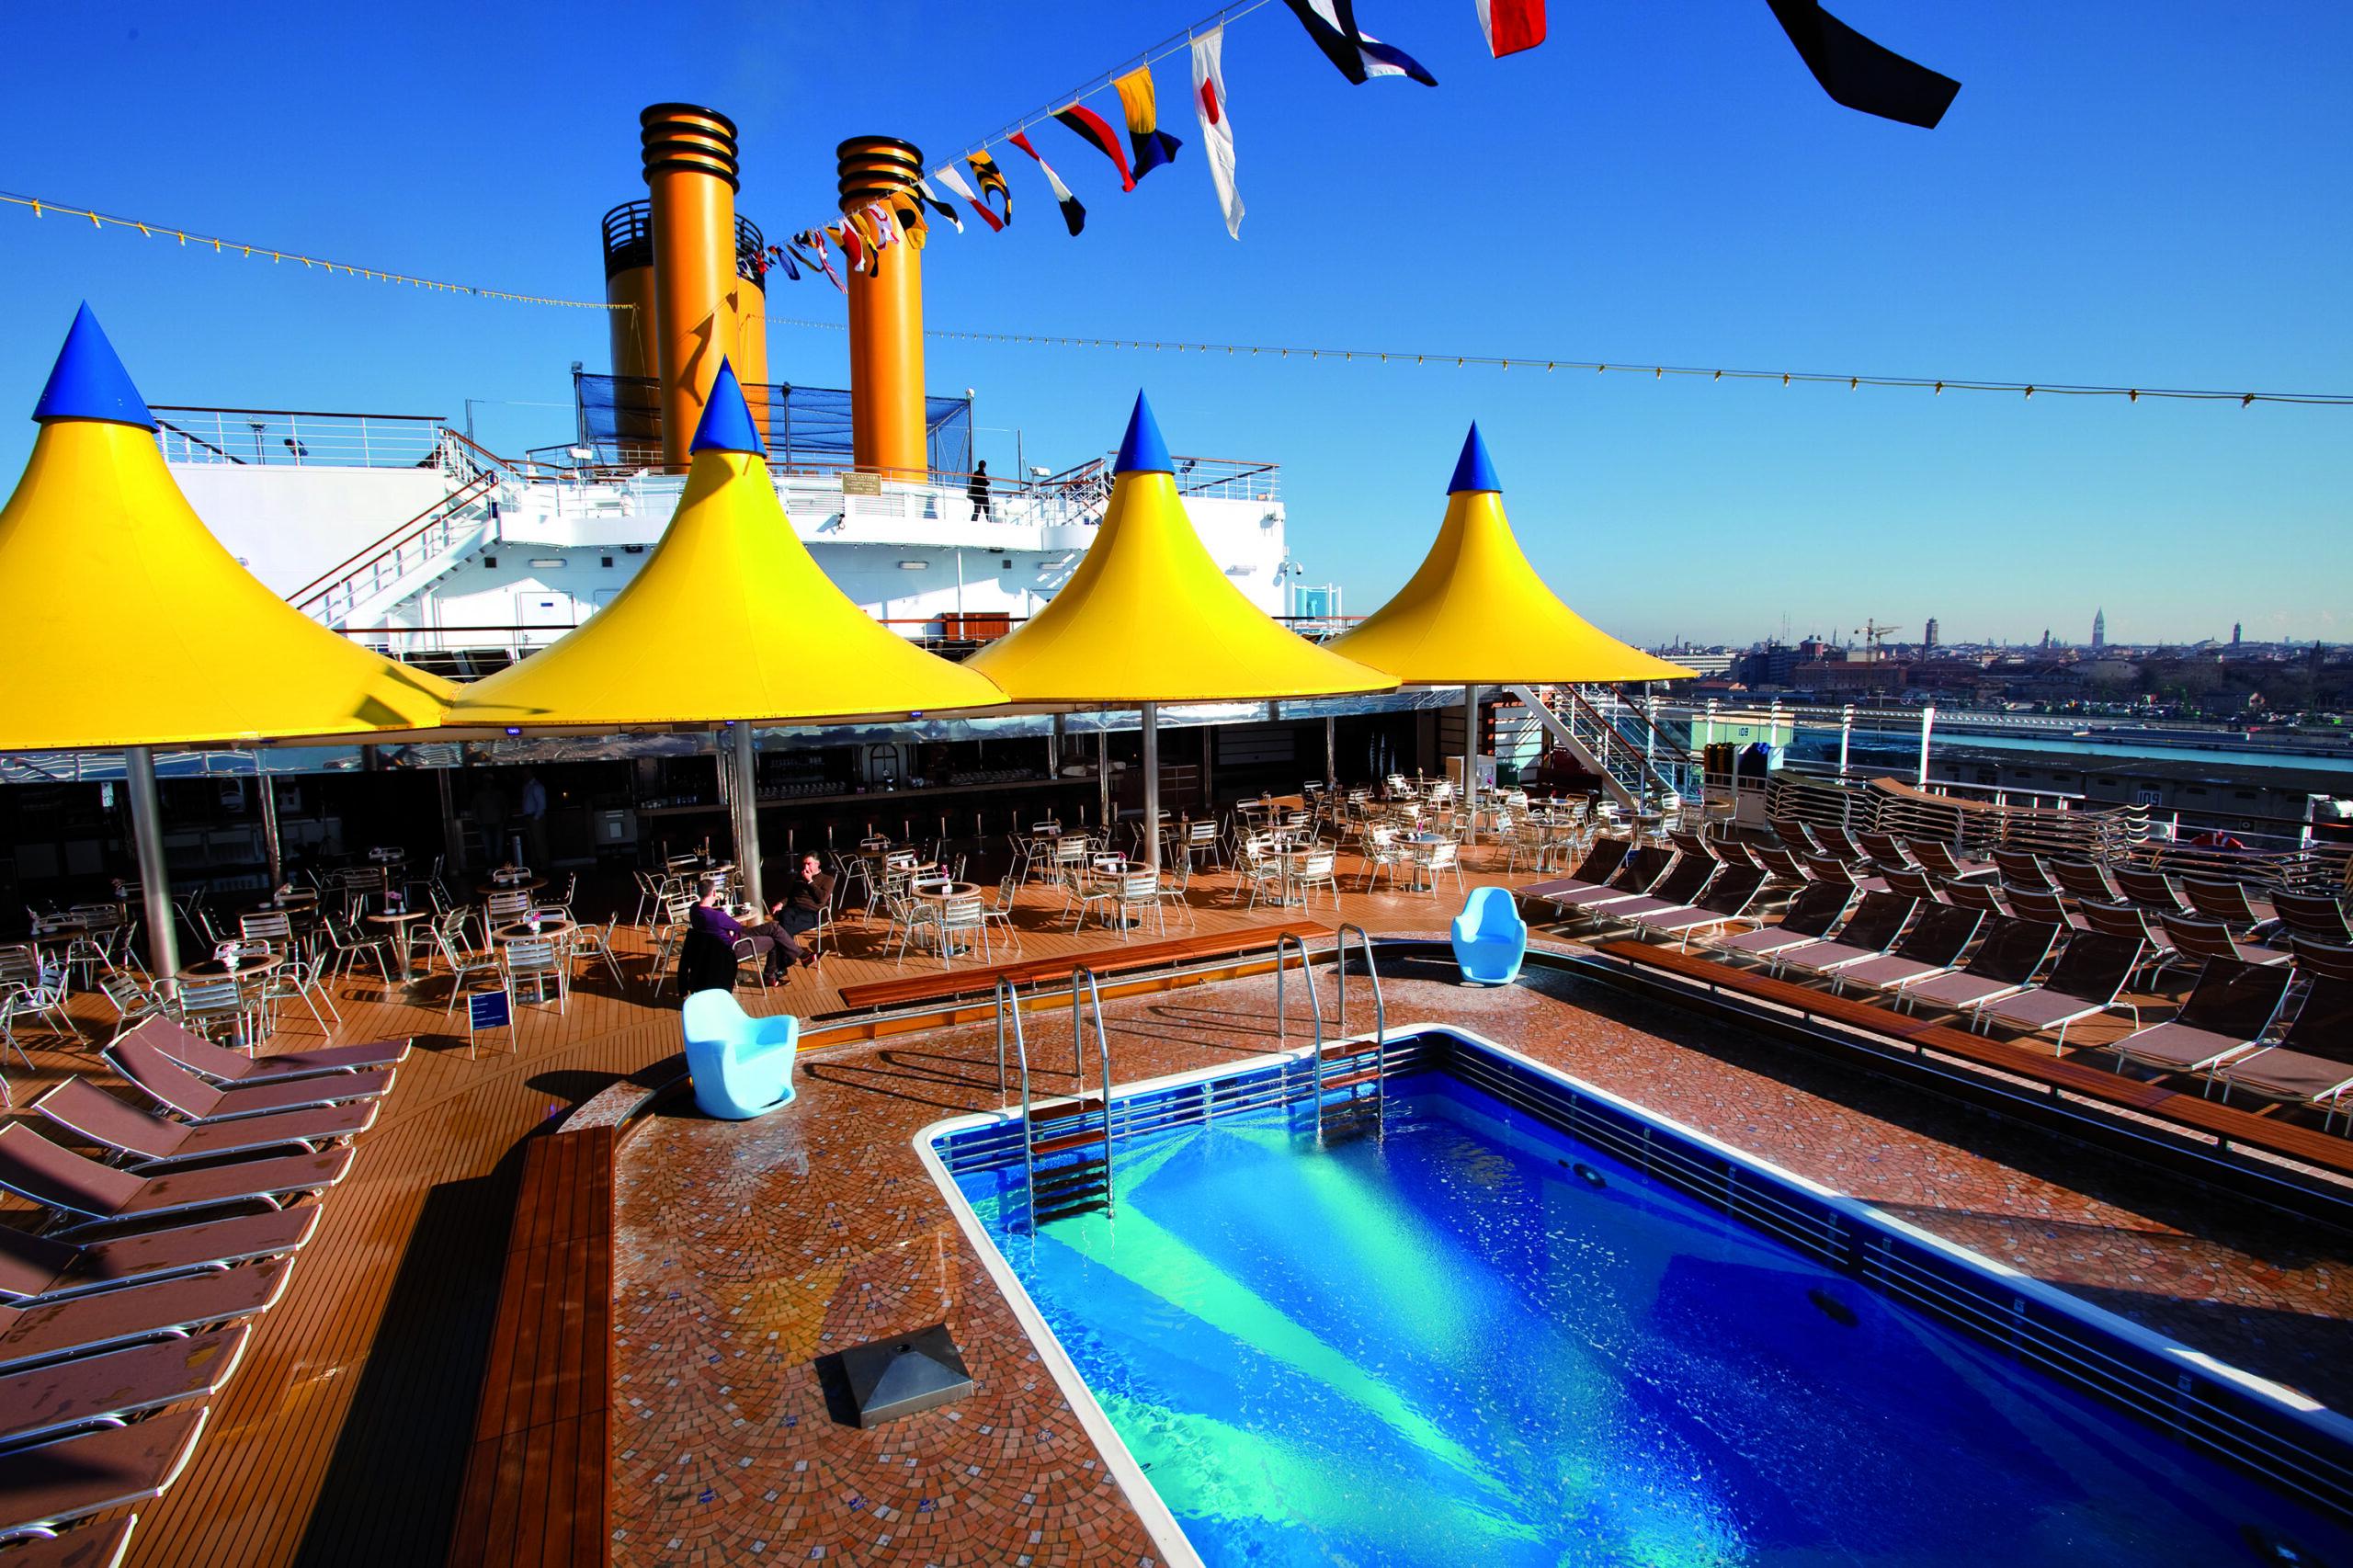 Cruiseschip-Costa Deliziosa-Costa Cruises-Zwembad